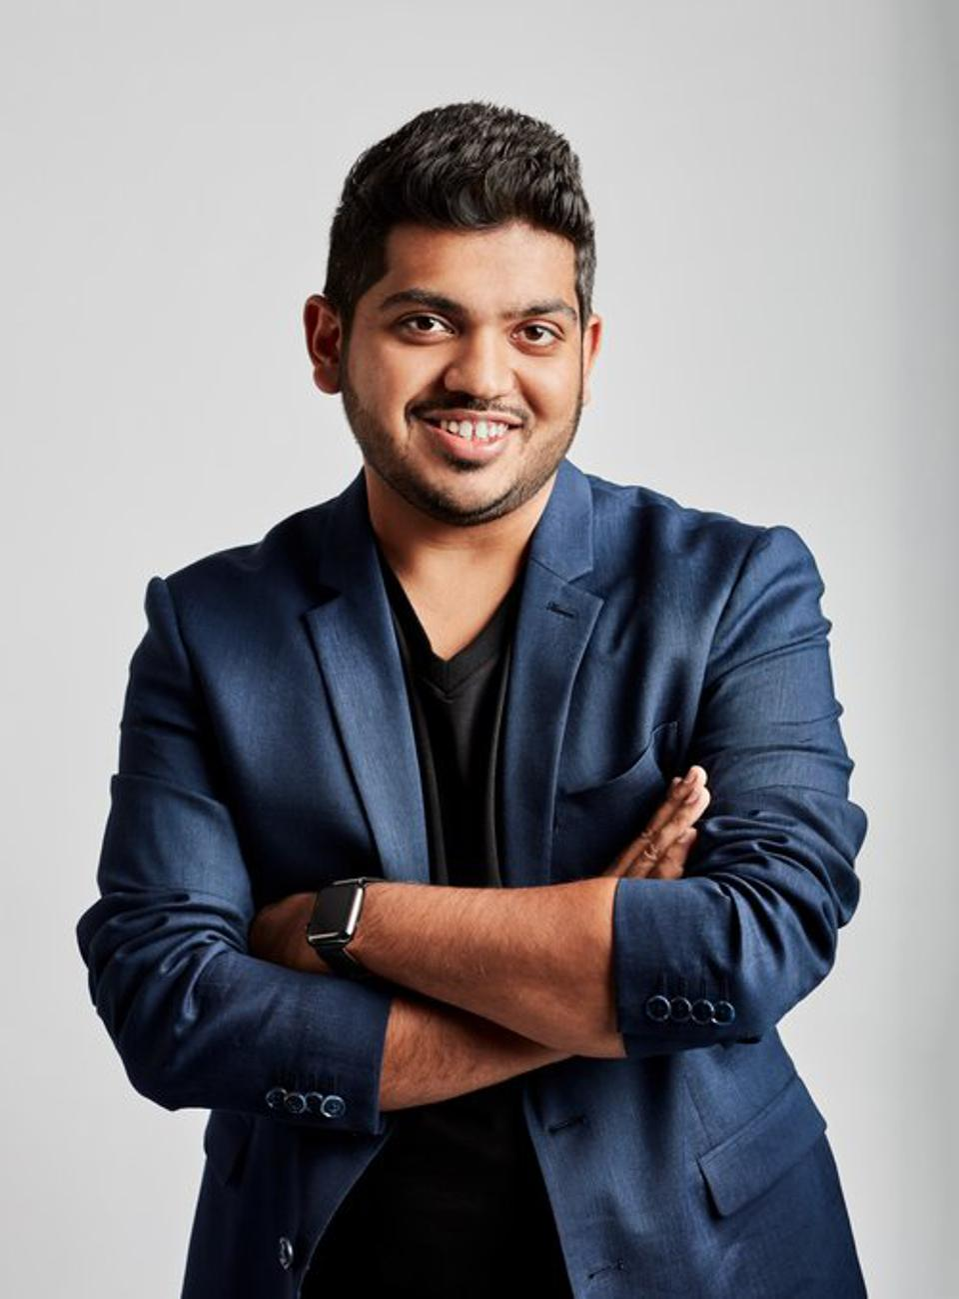 Forbes 30 Under 30 Science Alum Karan Jani